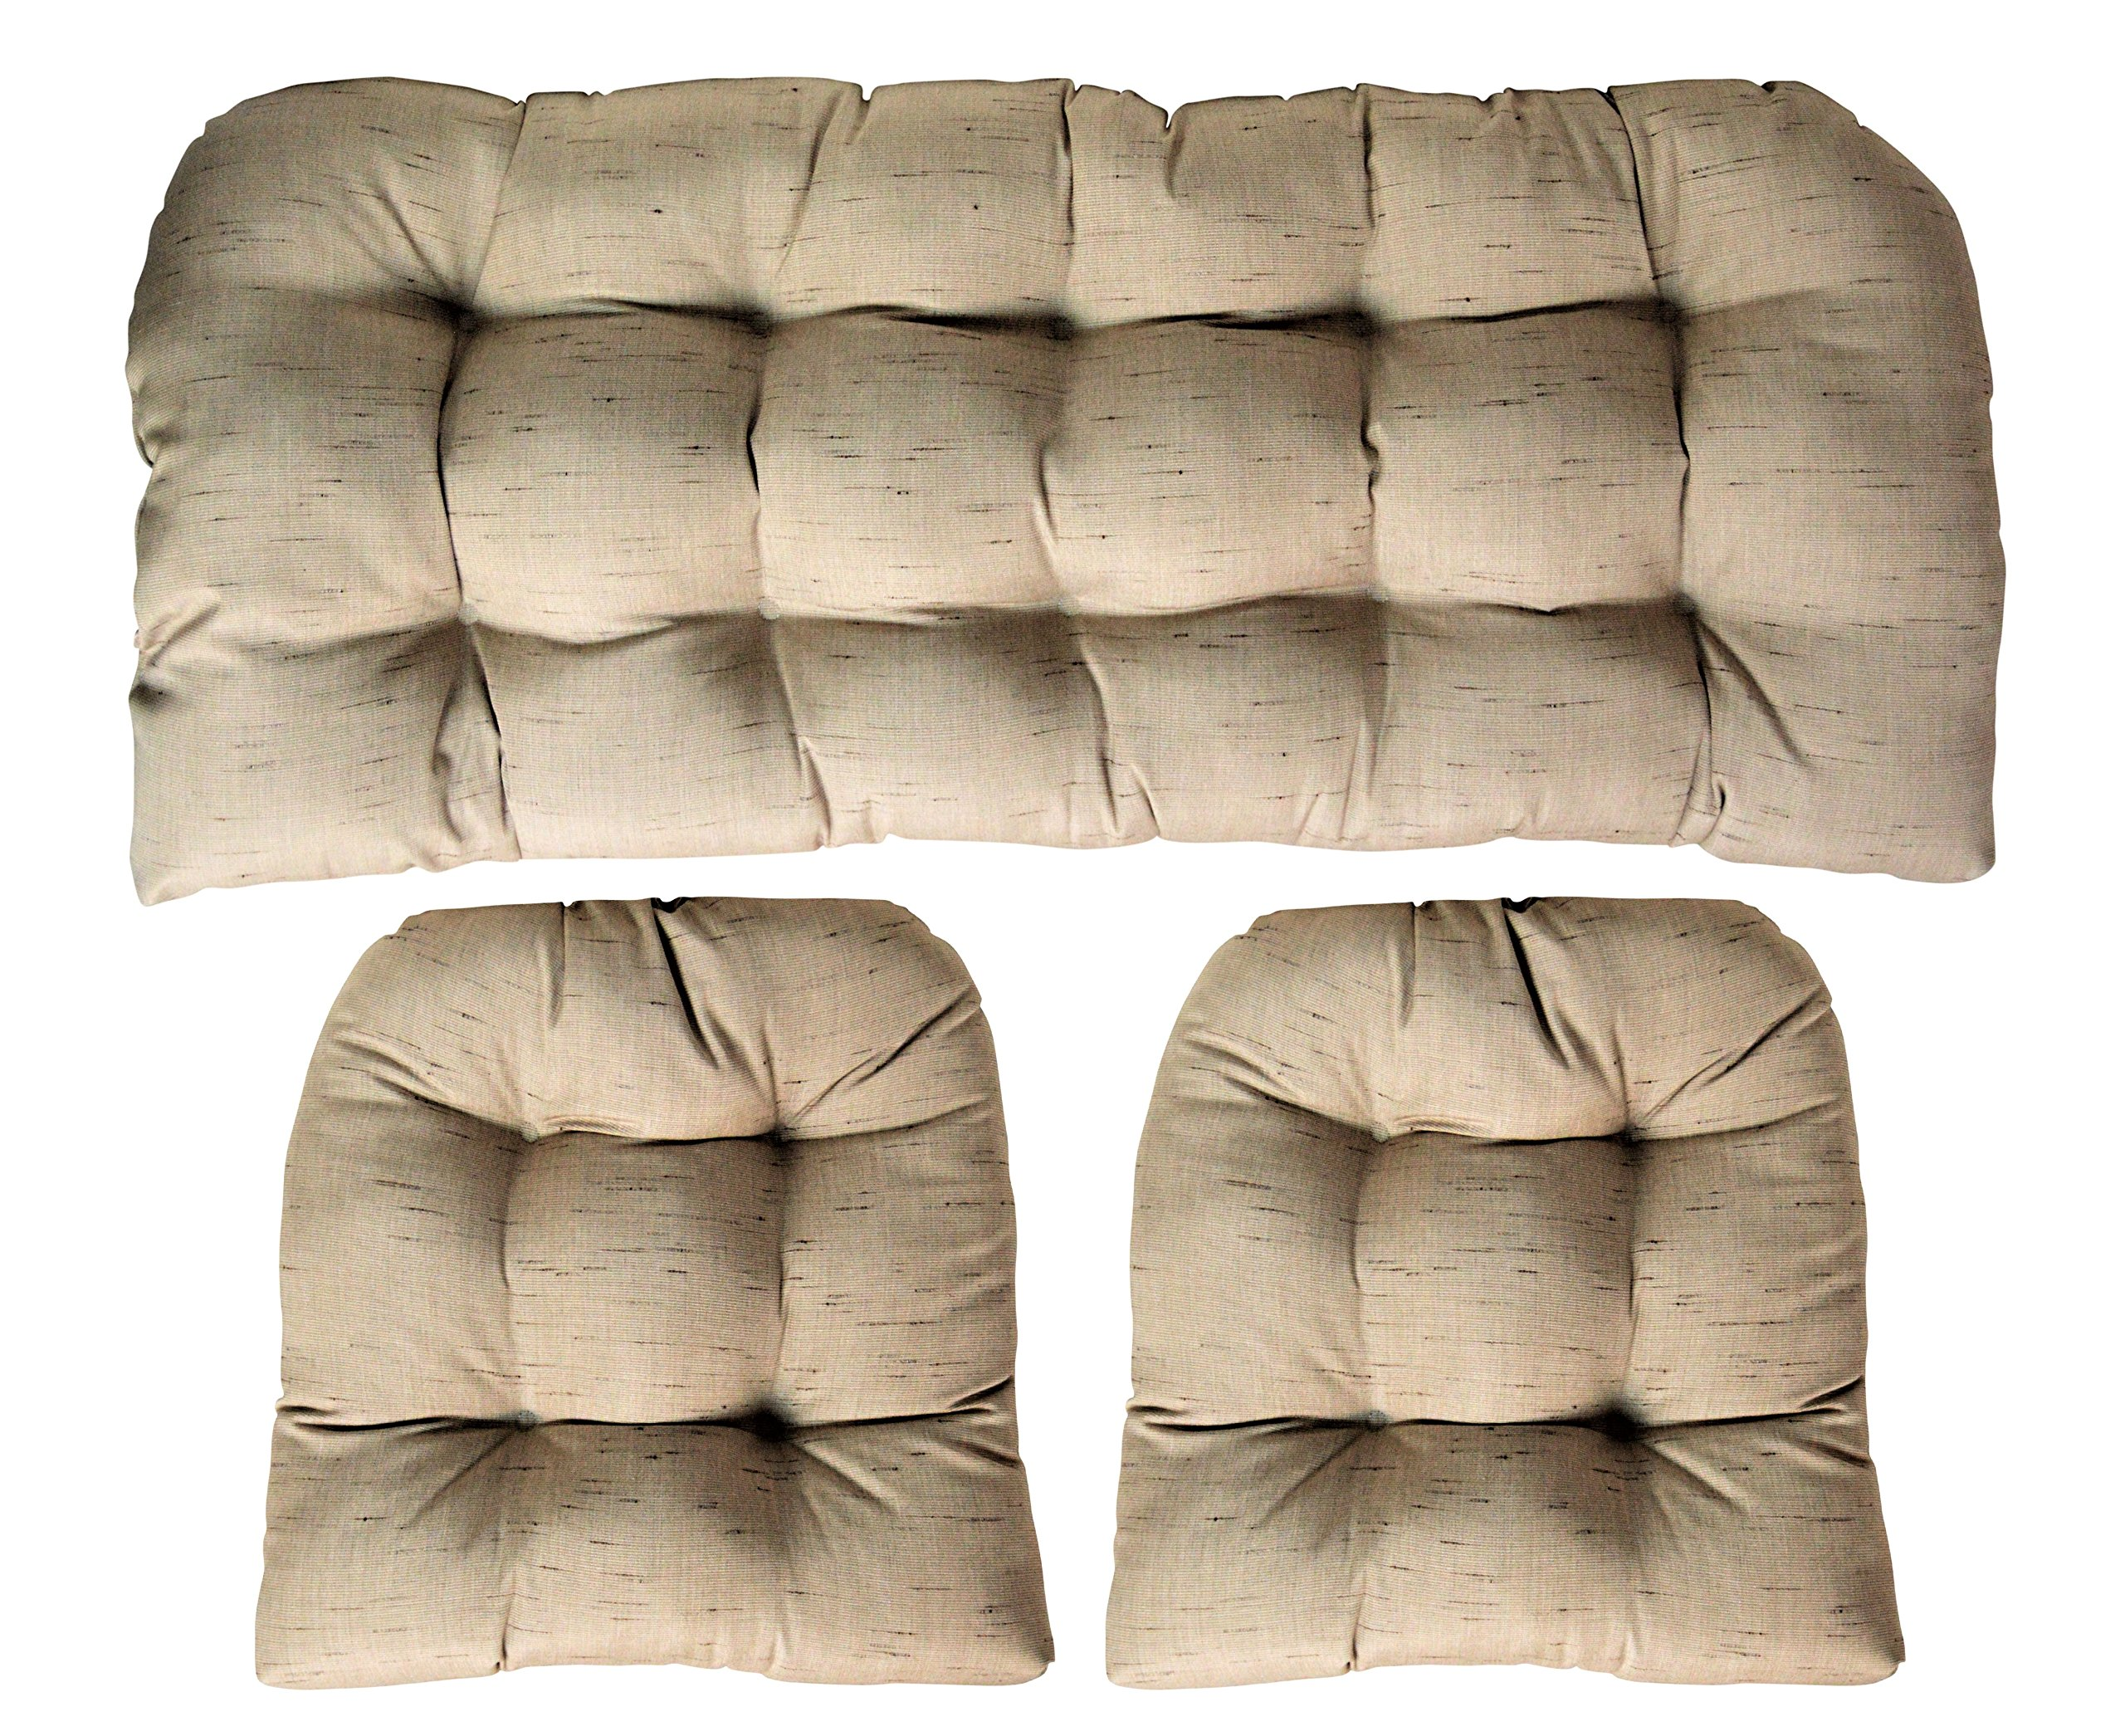 Sunbrella Frequency Sand 3 Piece Wicker Cushion Set - Indoor / Outdoor Wicker Loveseat Settee & 2 Matching Chair Cushions - Linen Look Tan / Beige